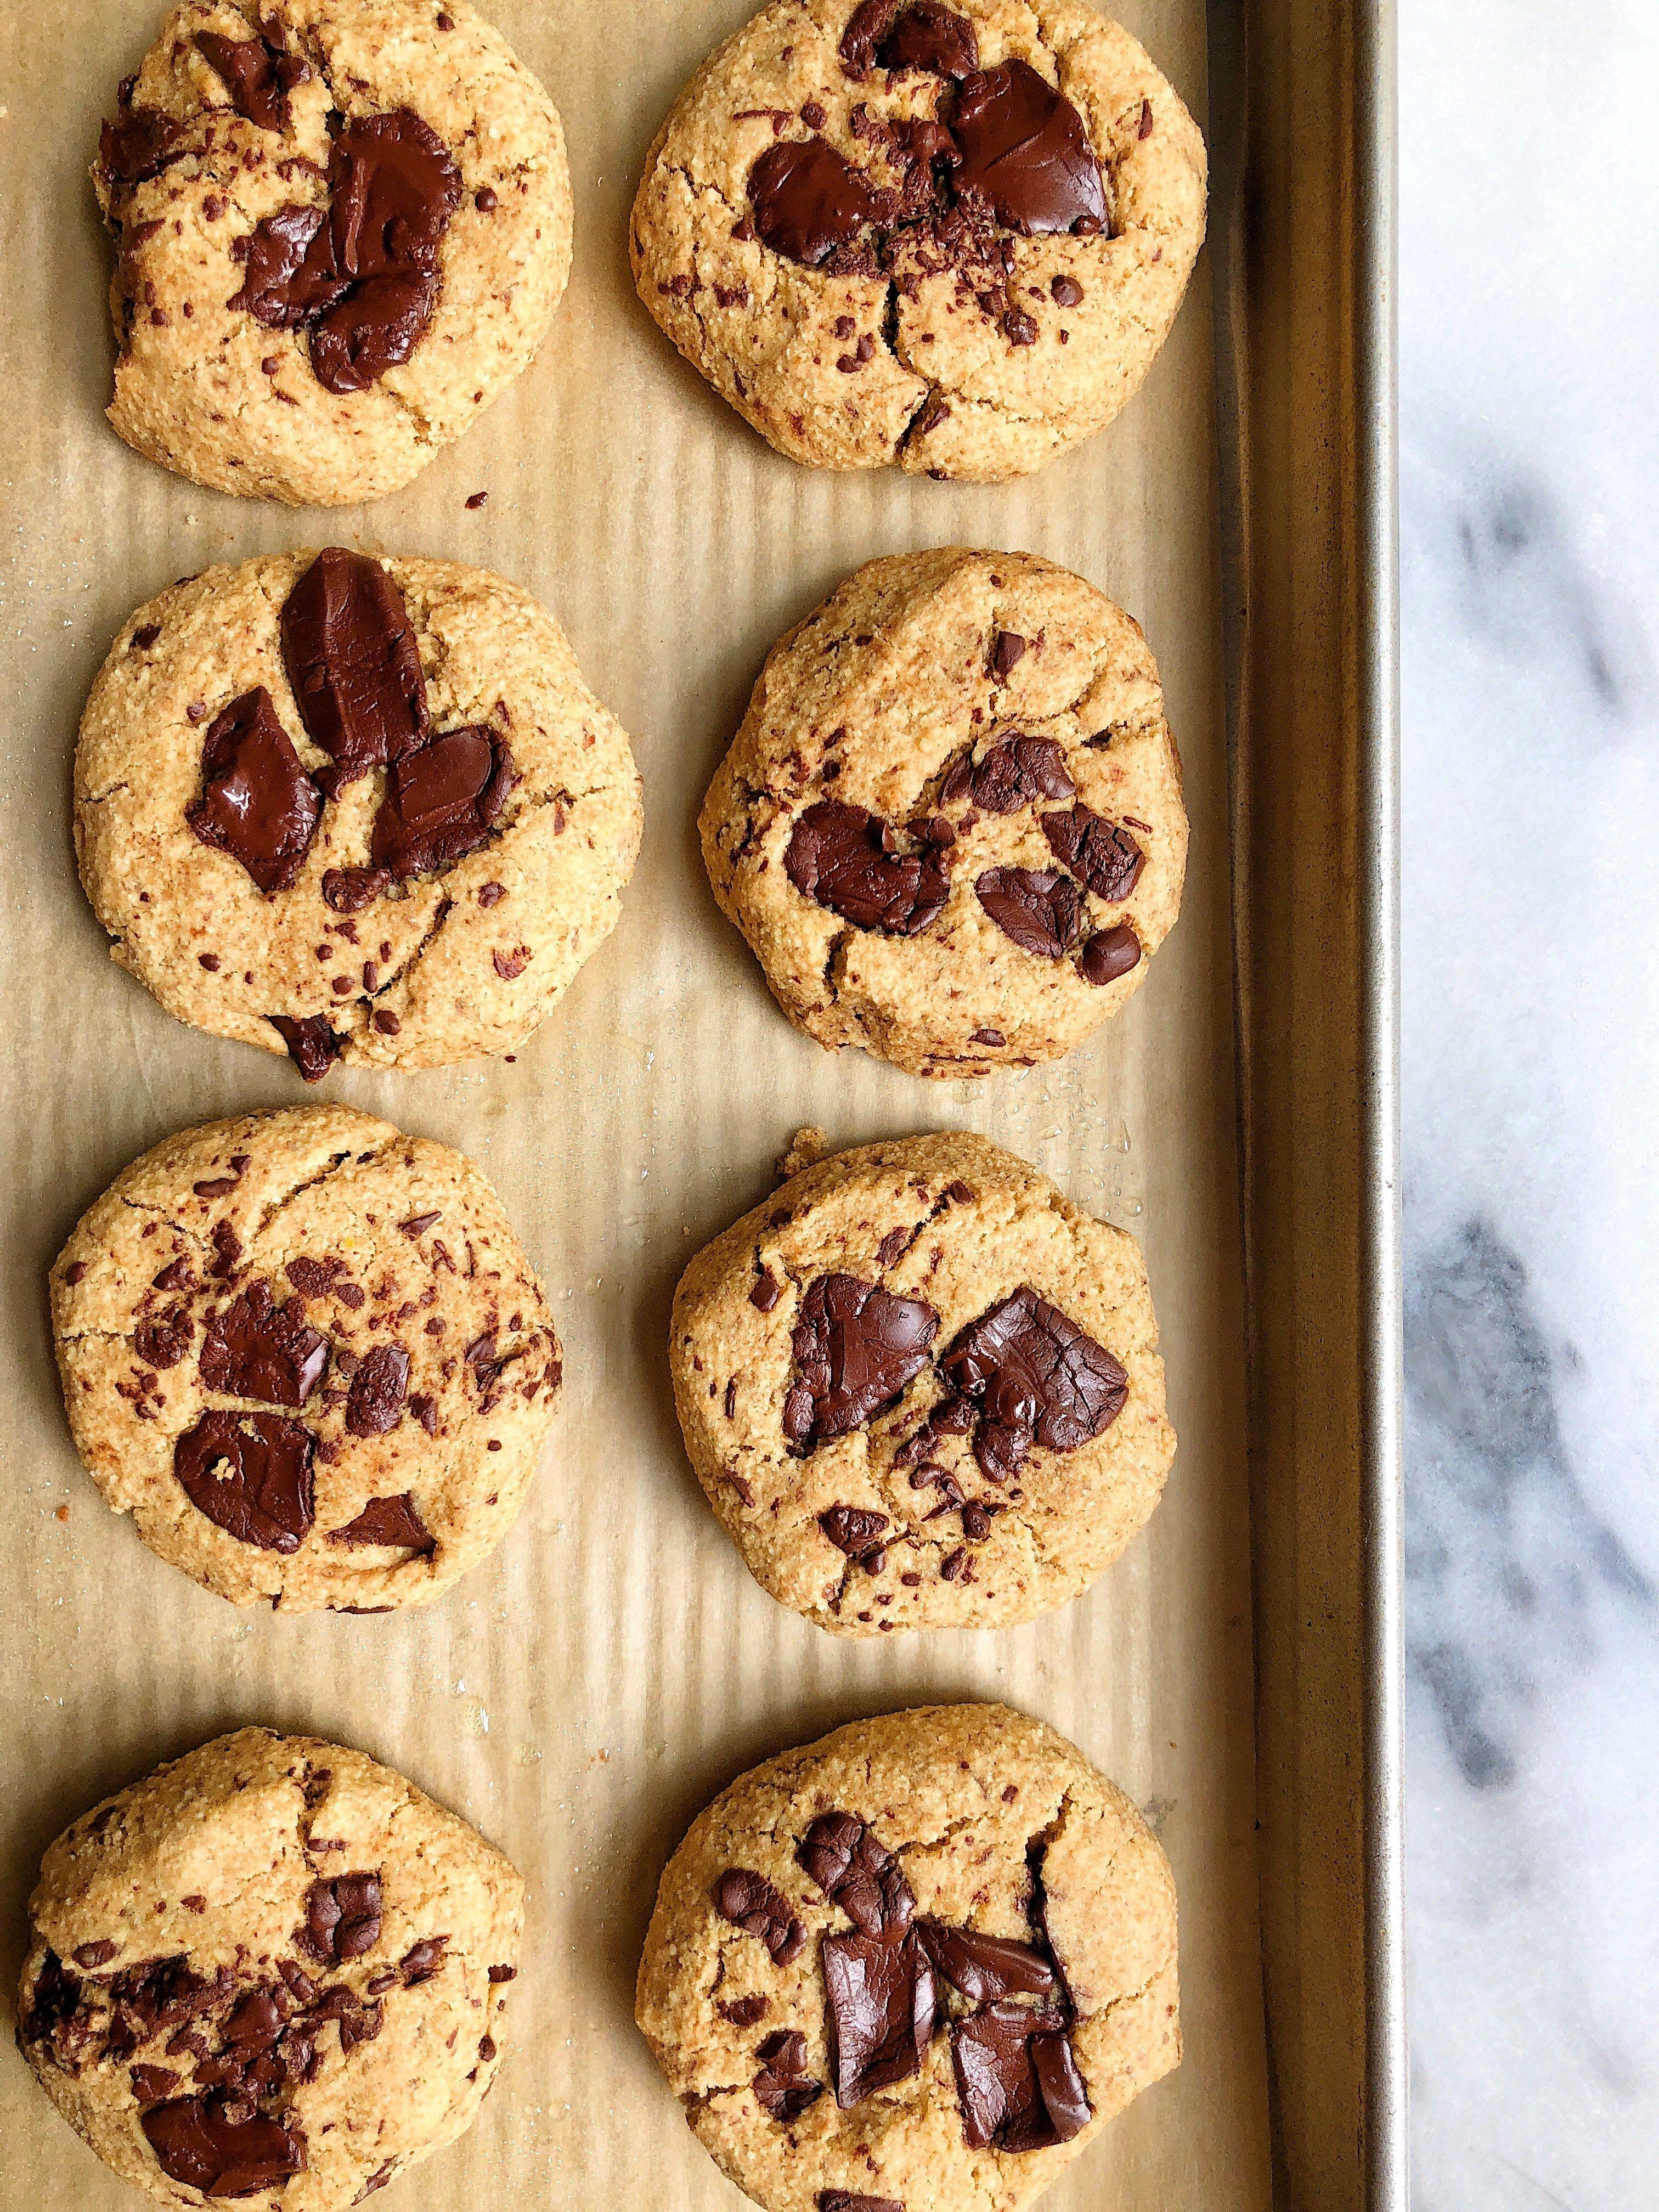 Vegan Recipes With Coconut Flour